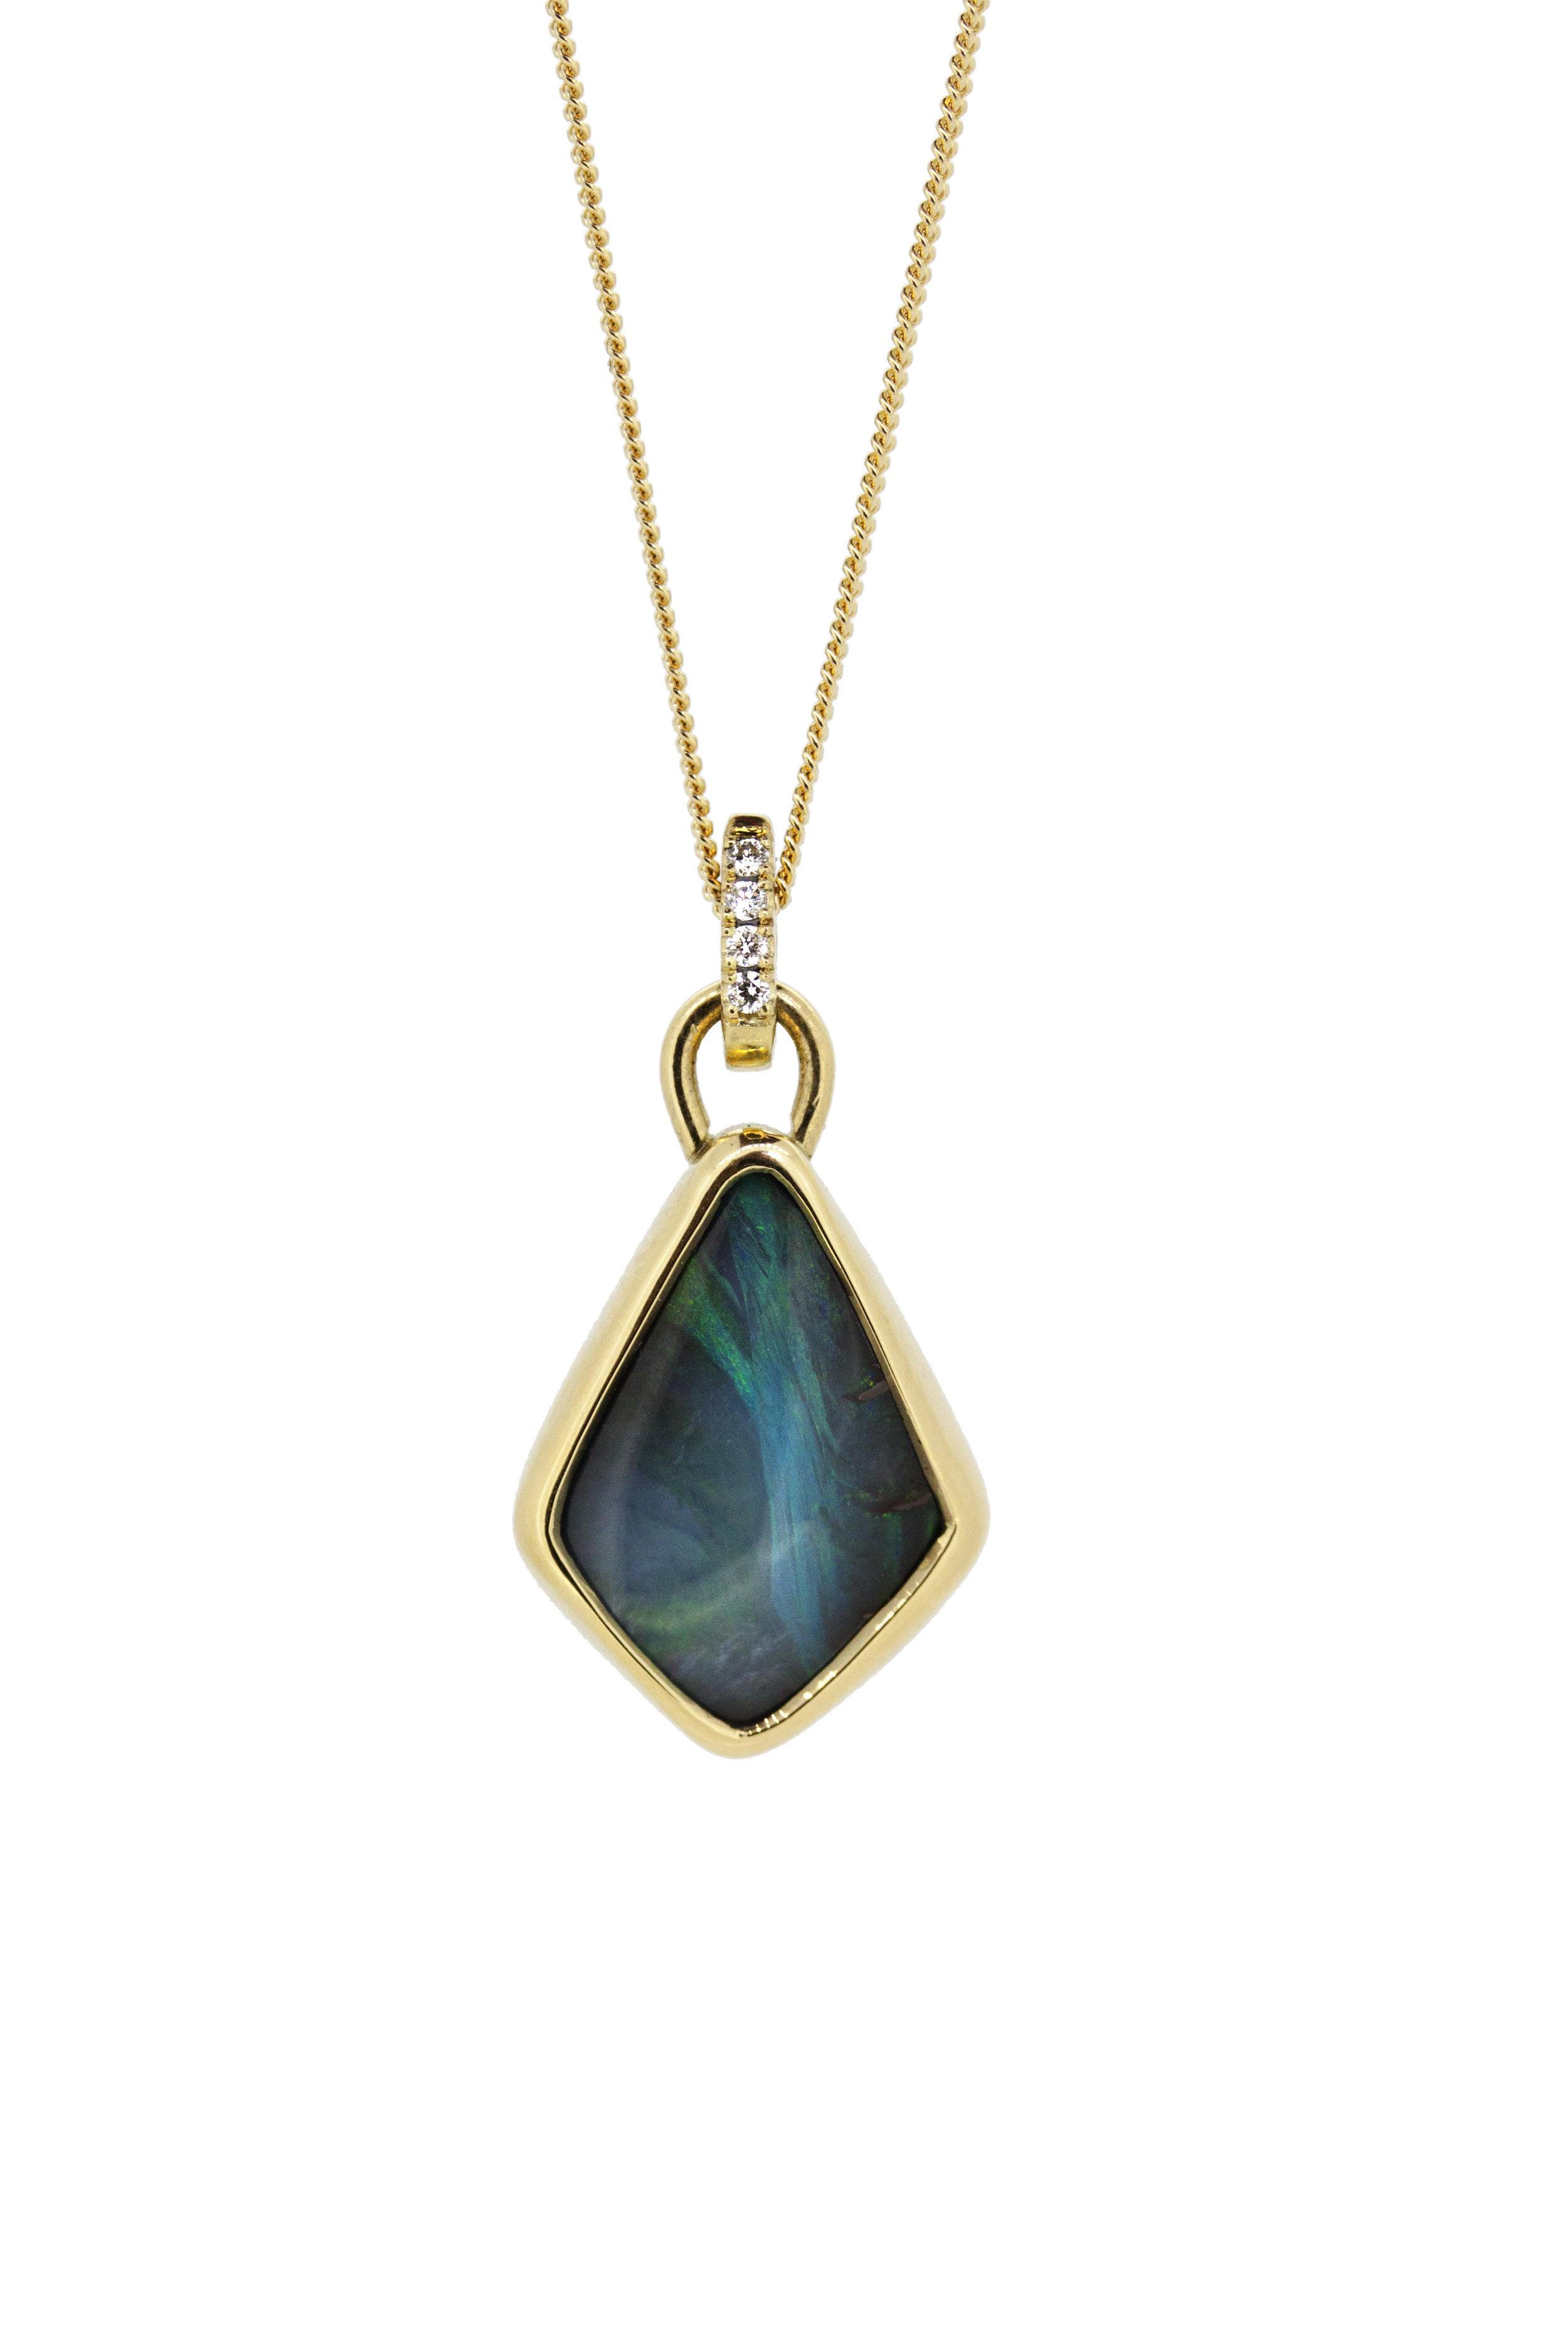 boulder opal with diamond jump sorrel bay.jpg